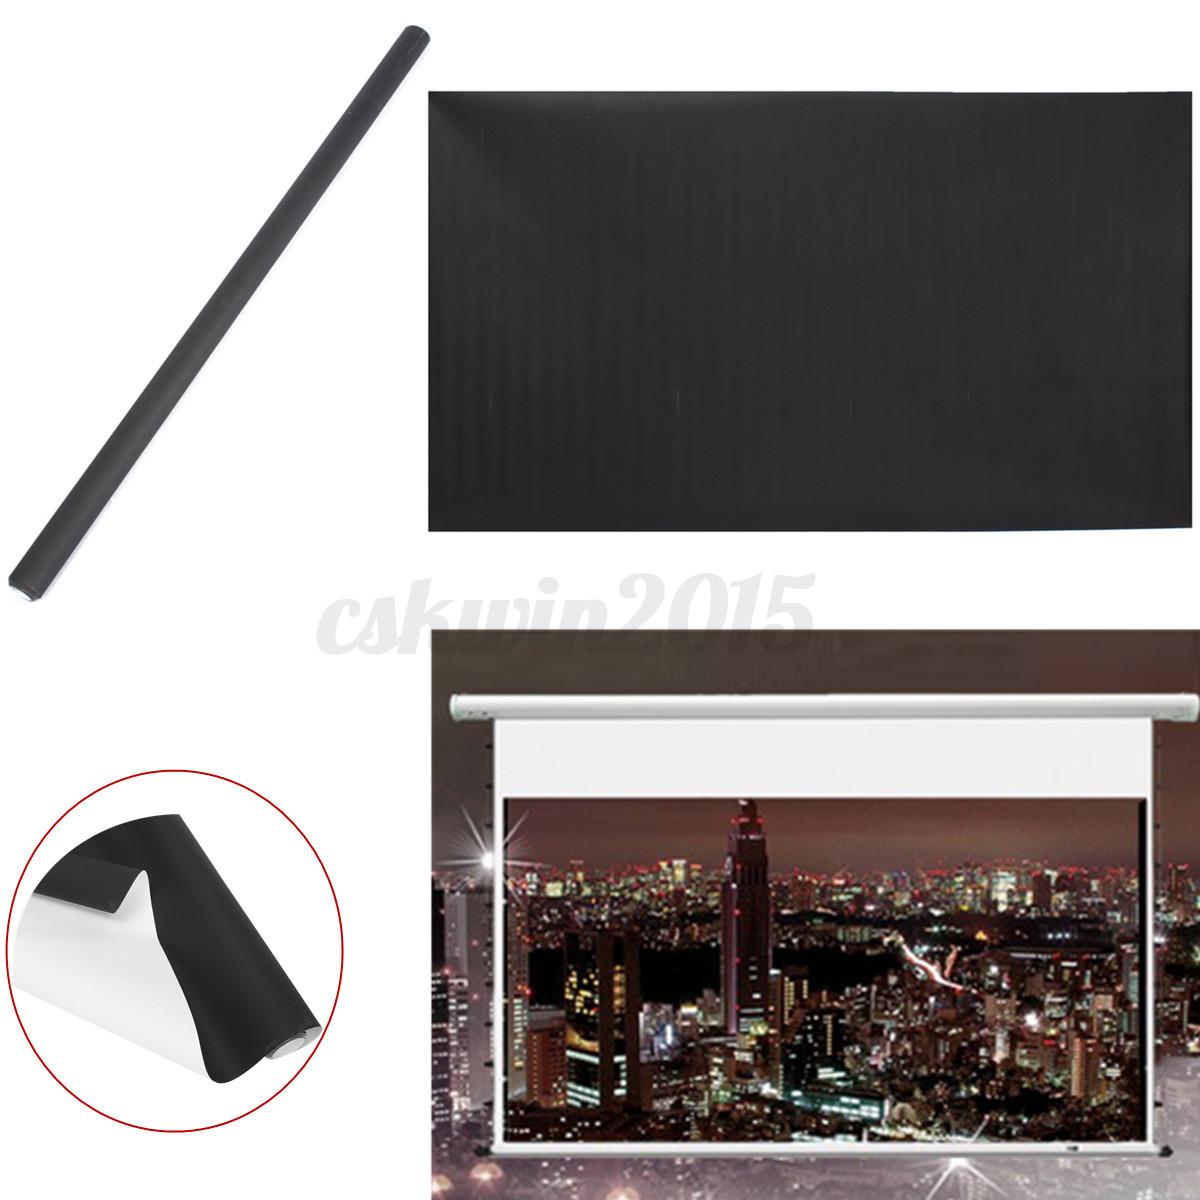 100 16 9 hd projektor bildschirm leinwand beamer beamerleinwand rollleinwand ebay. Black Bedroom Furniture Sets. Home Design Ideas